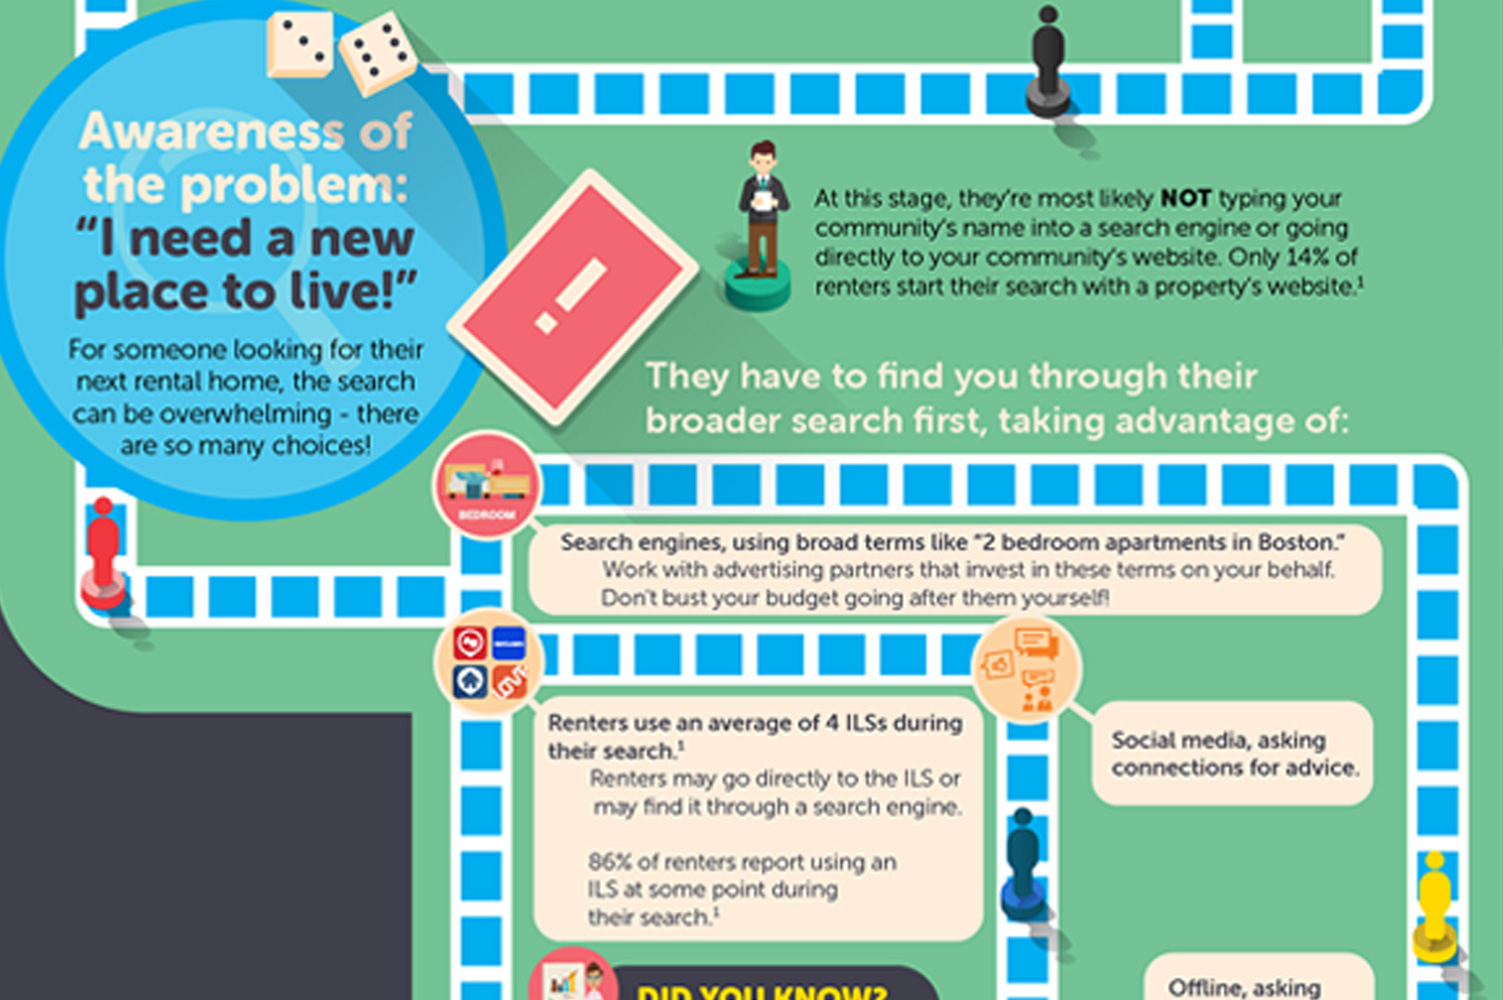 The Renter's Journey Infographic